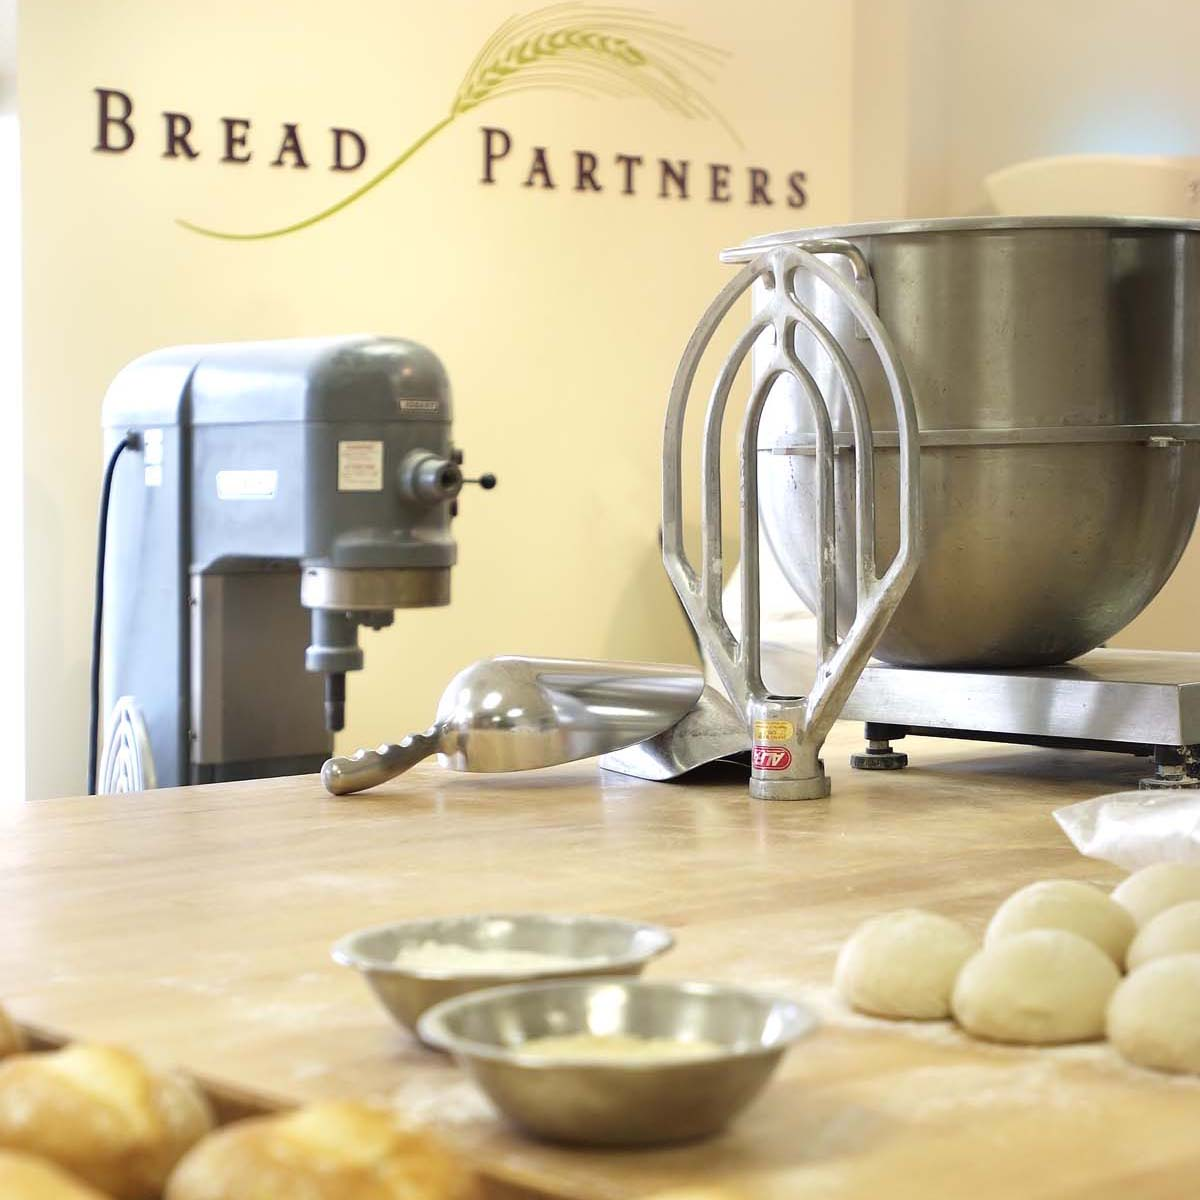 Bread Partners